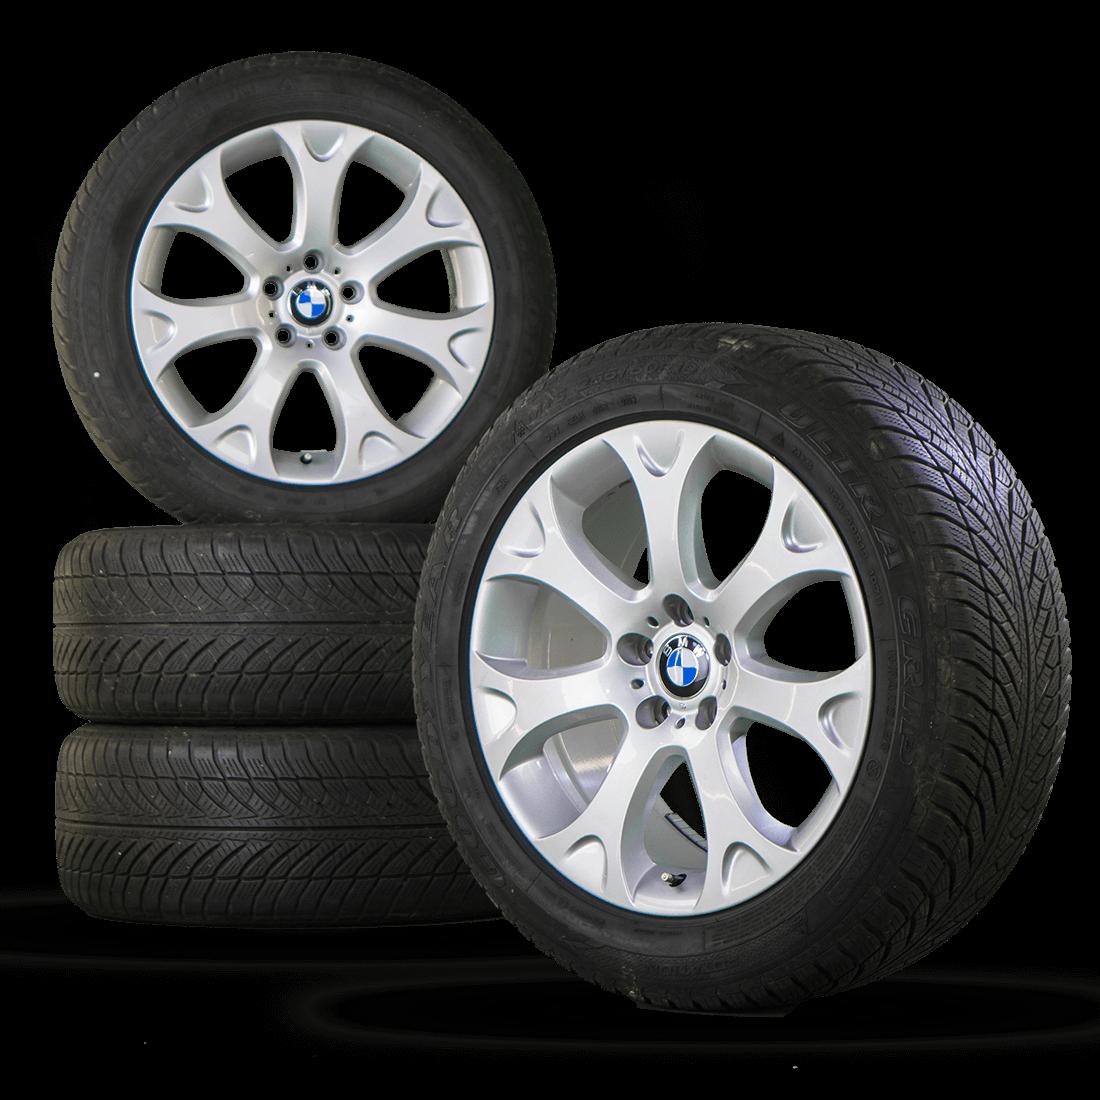 BMW 19 Inch Rims X5 E70 Aluminum Rims Winter Tires Winter